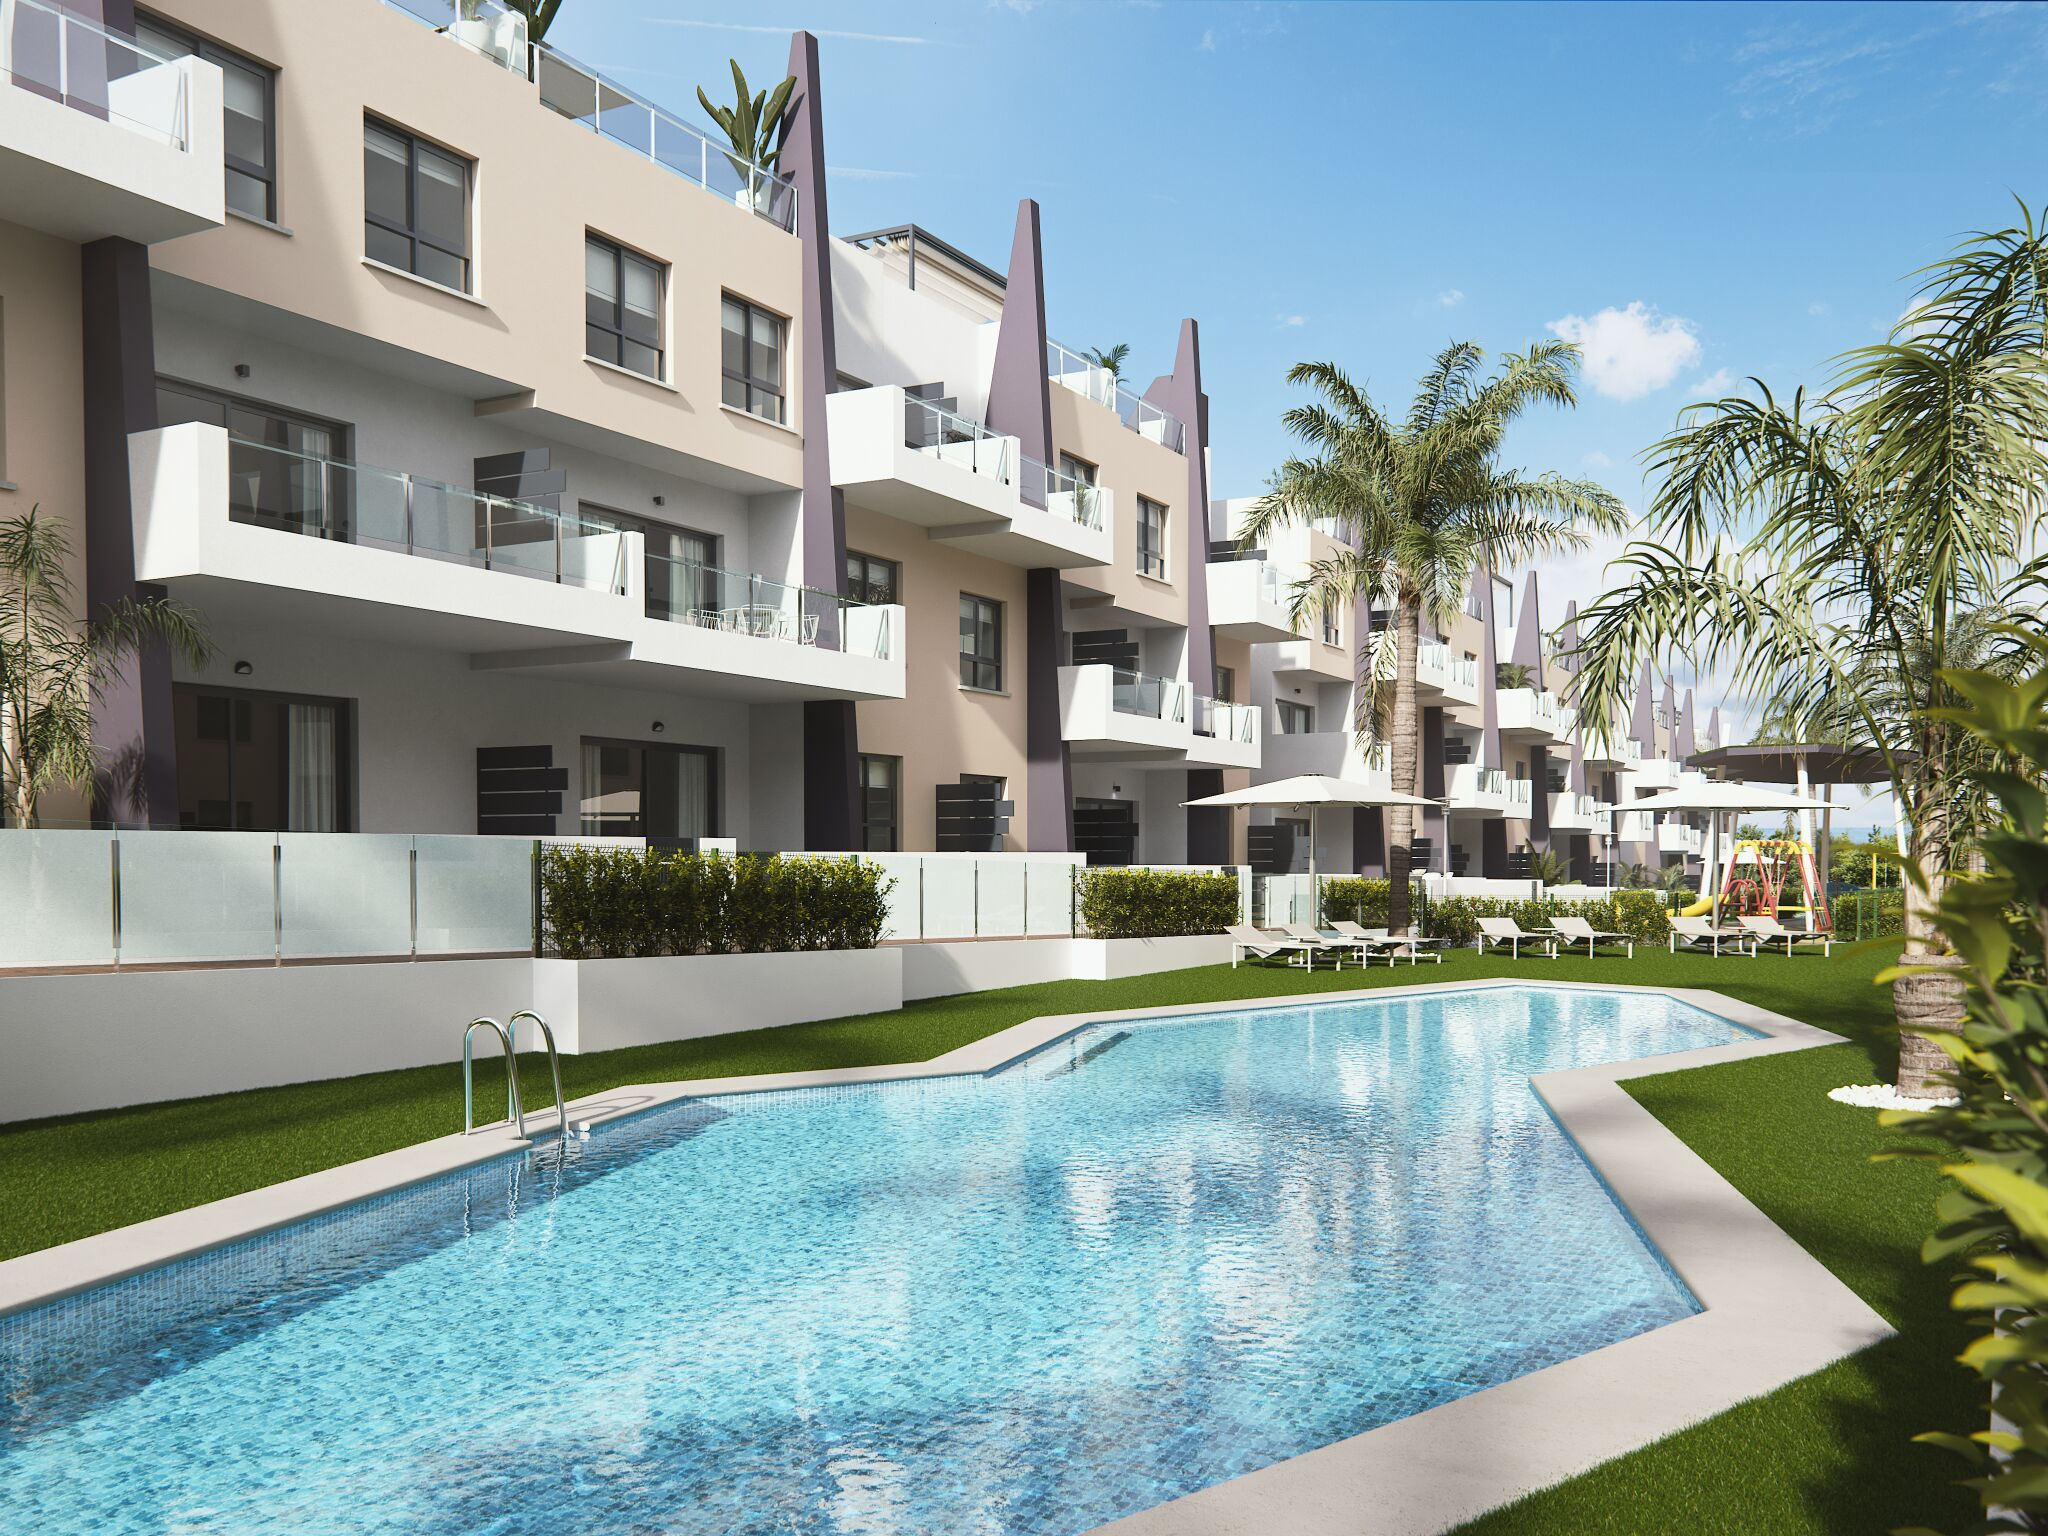 kf943324: Apartment for sale in Torre de la Horadada